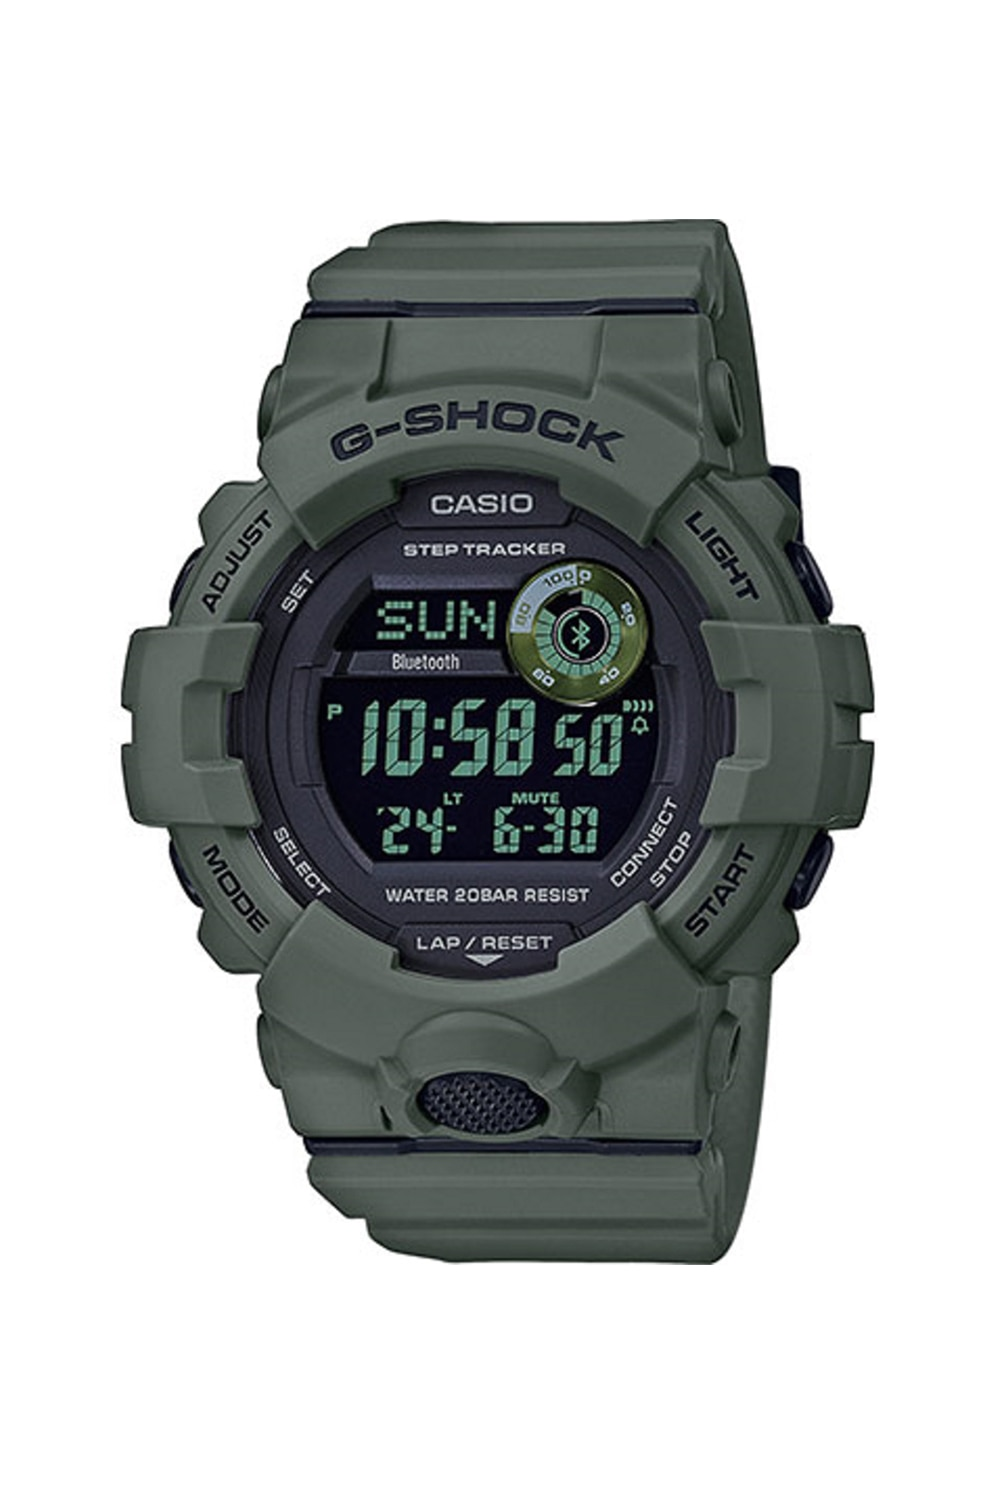 Fotografie Casio, Ceas digital cu functii multiple si pedometru G-Shock, Verde